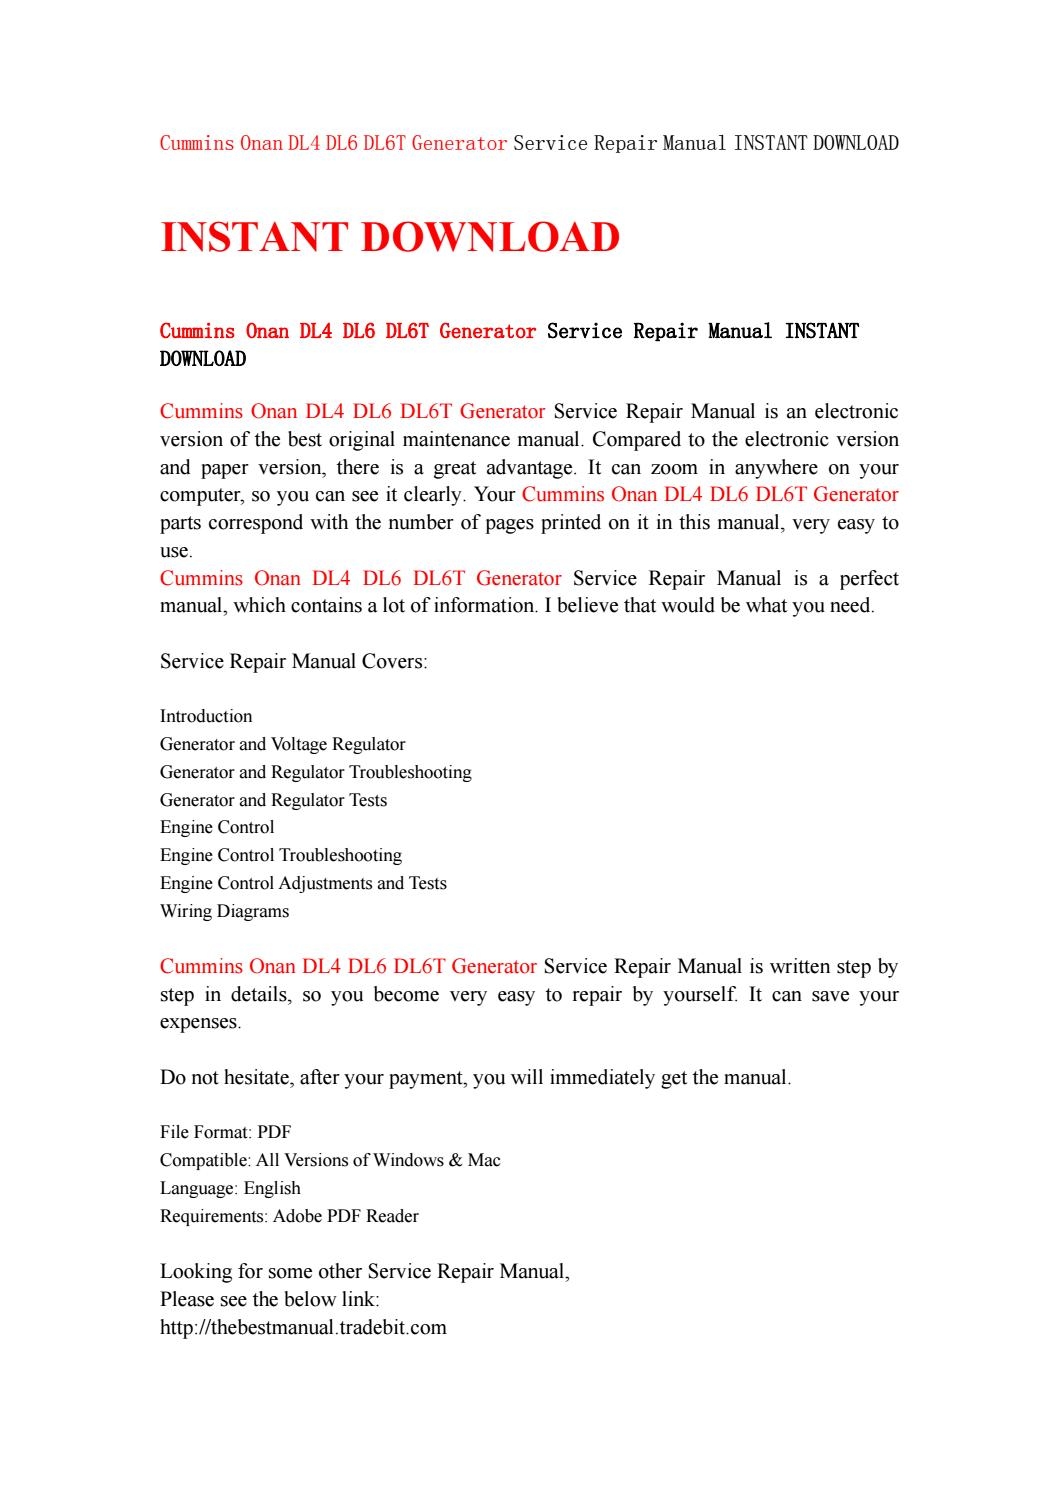 Cummins onan dl4 dl6 dl6t generator service repair manual instant